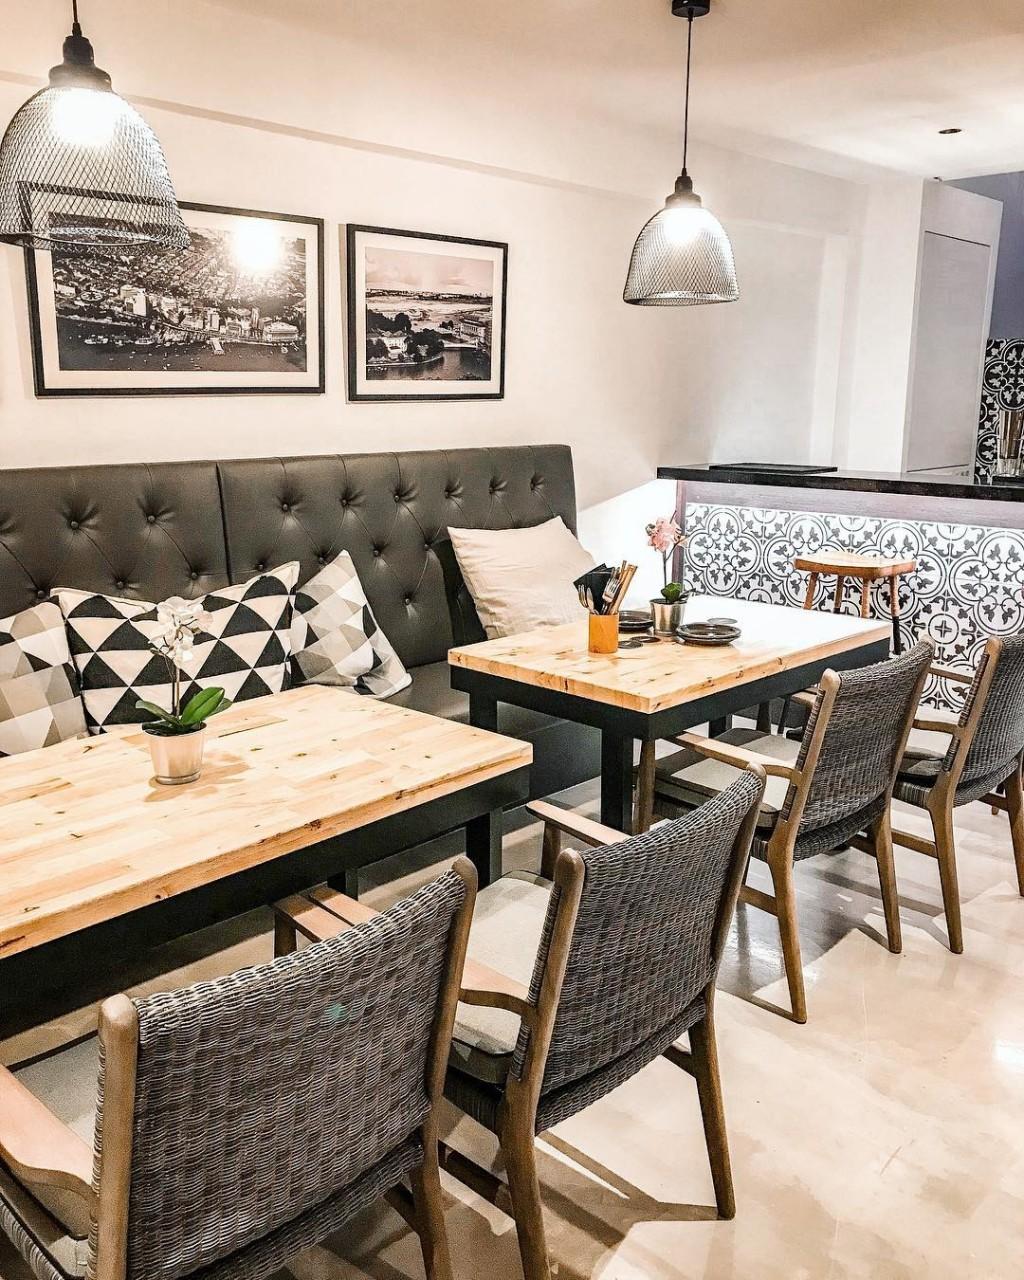 New restaurants - The Sampan